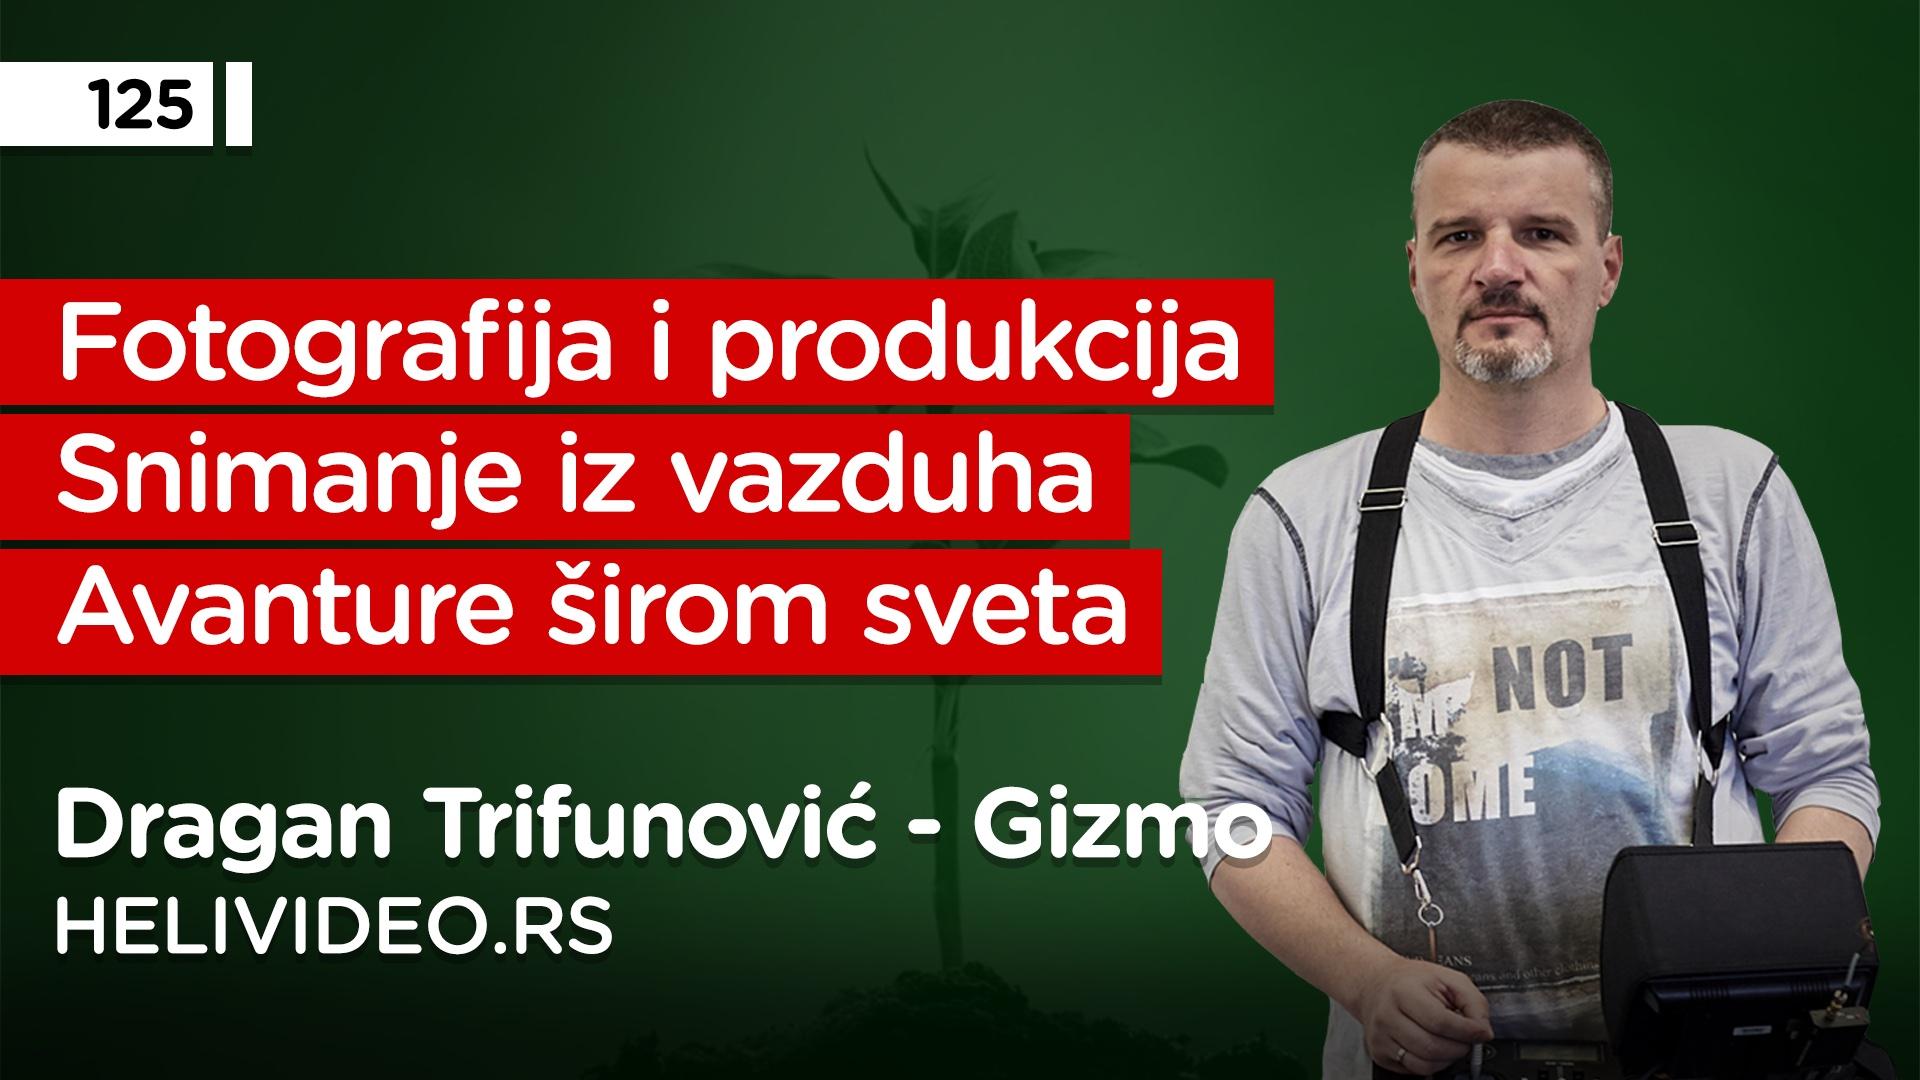 EP125: Dragan Trifunović